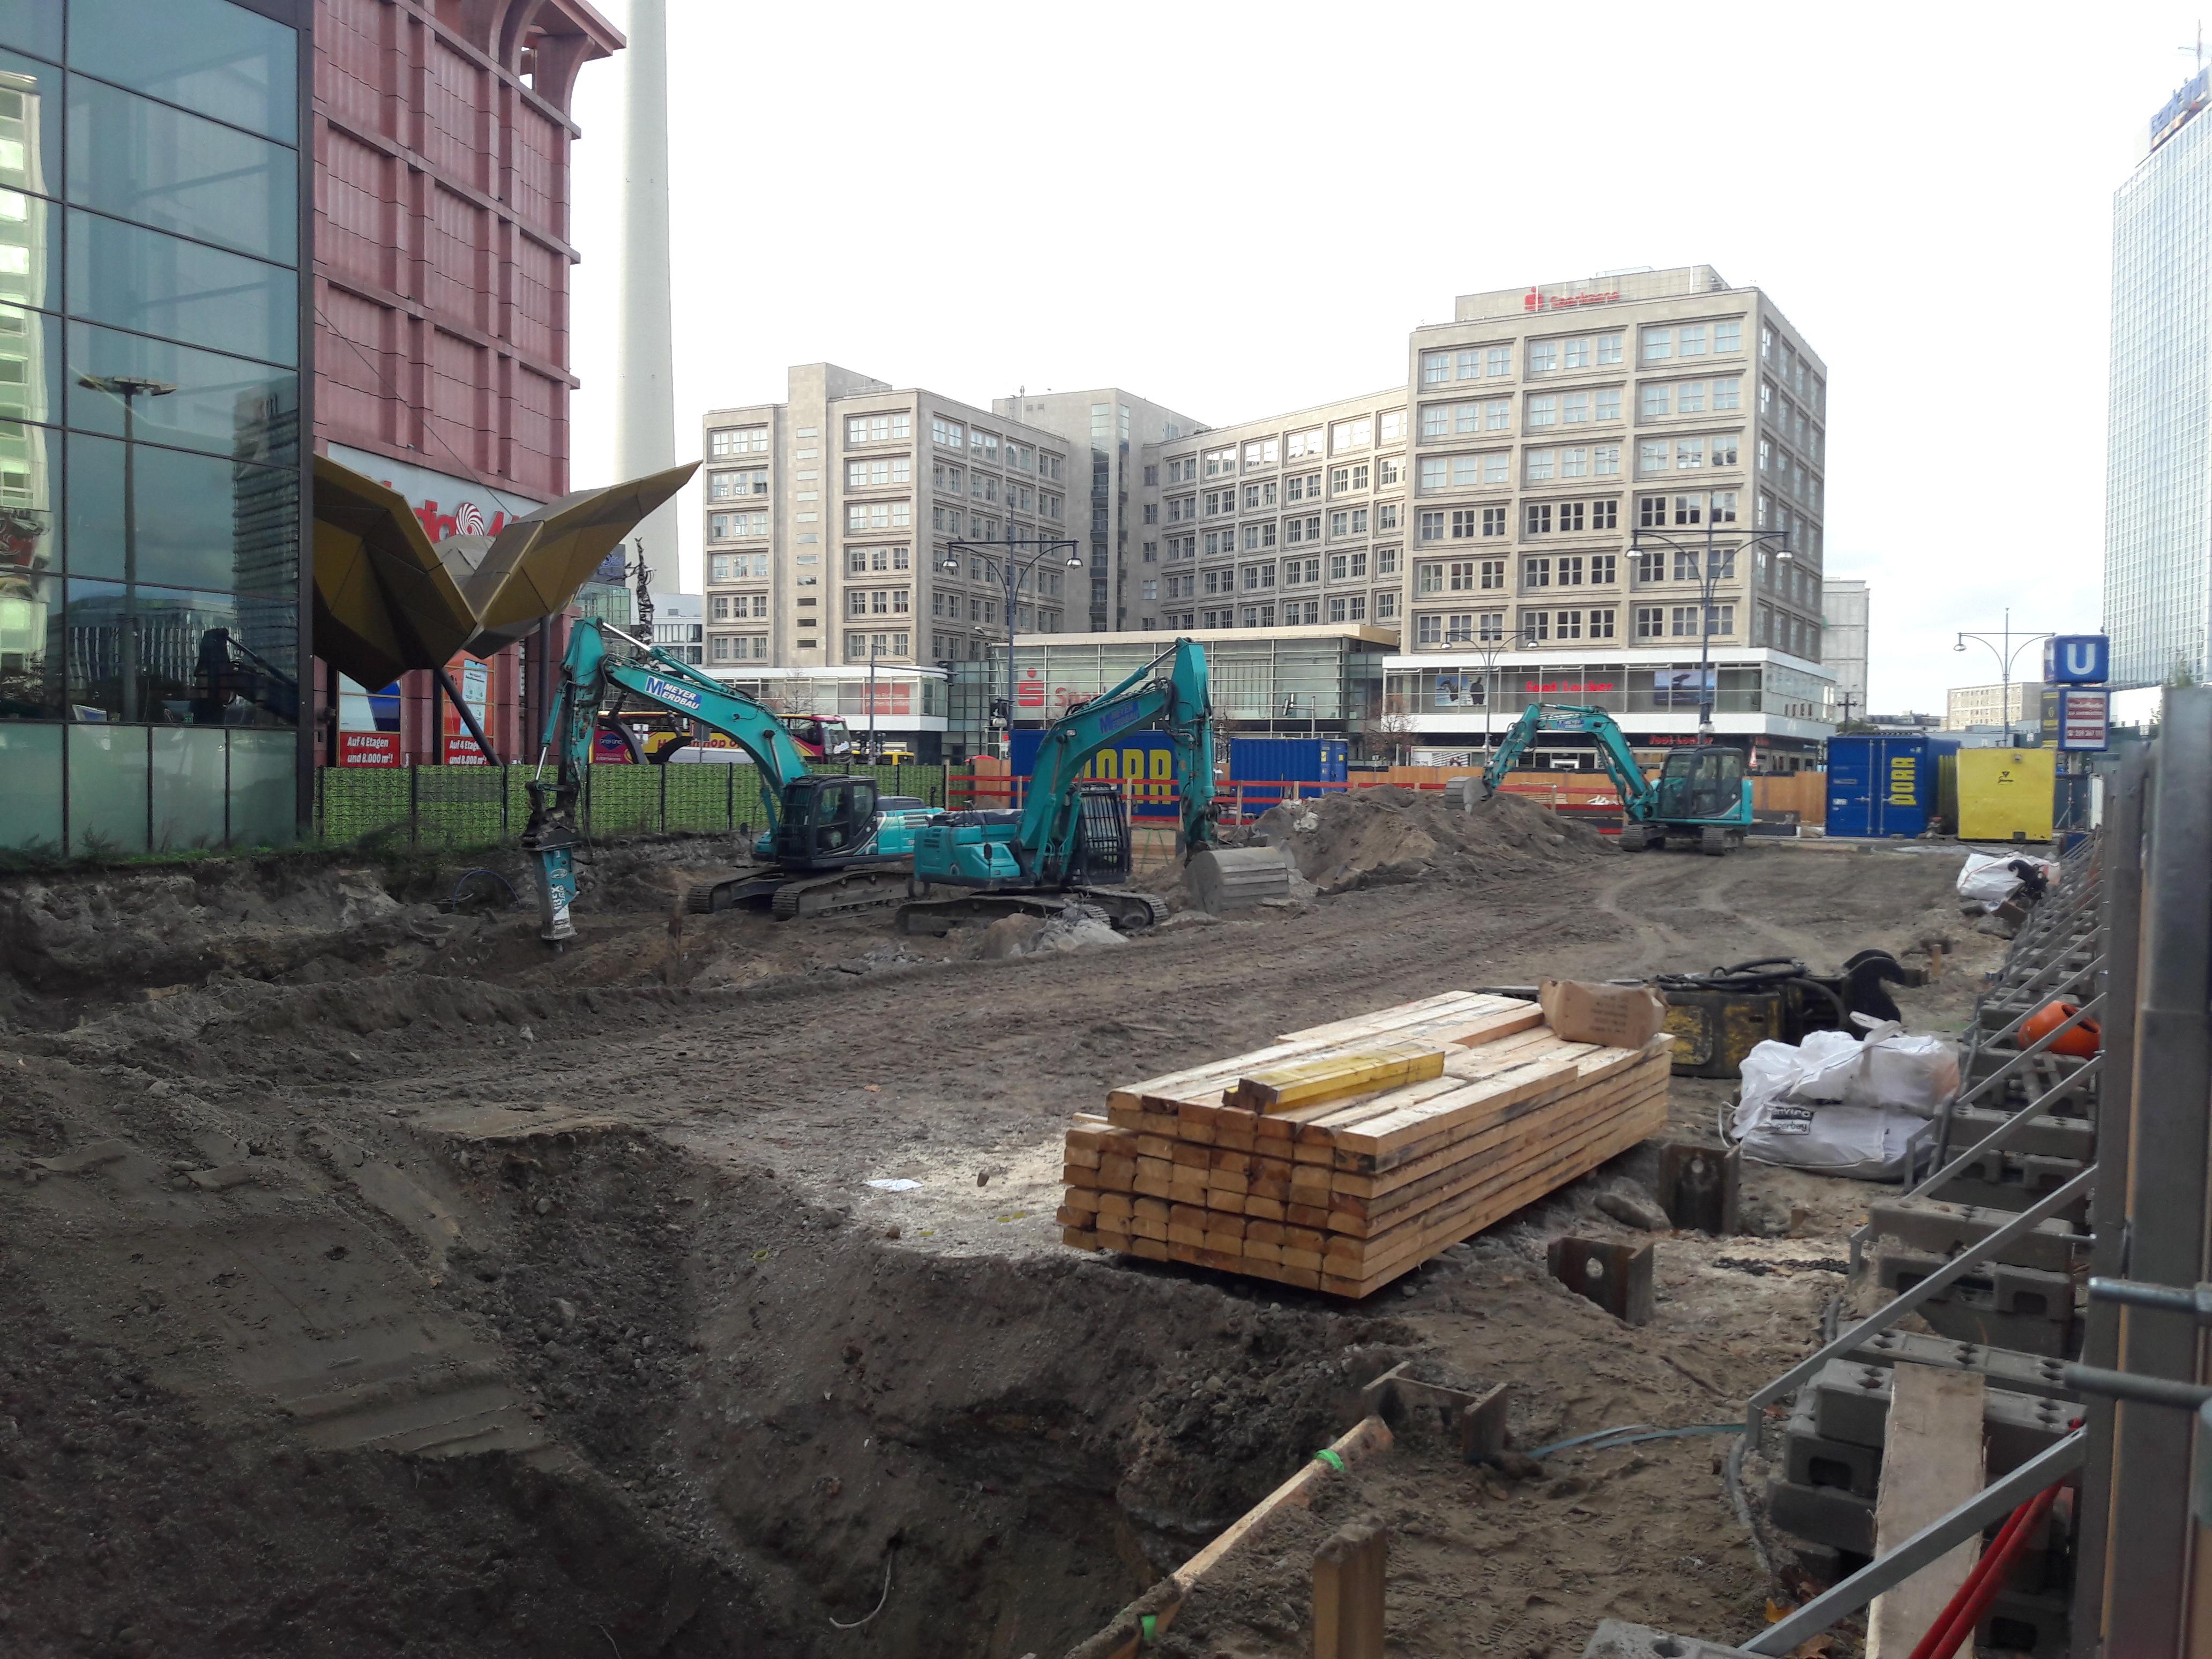 Monarch-berlin-alexanderplatz.jpg